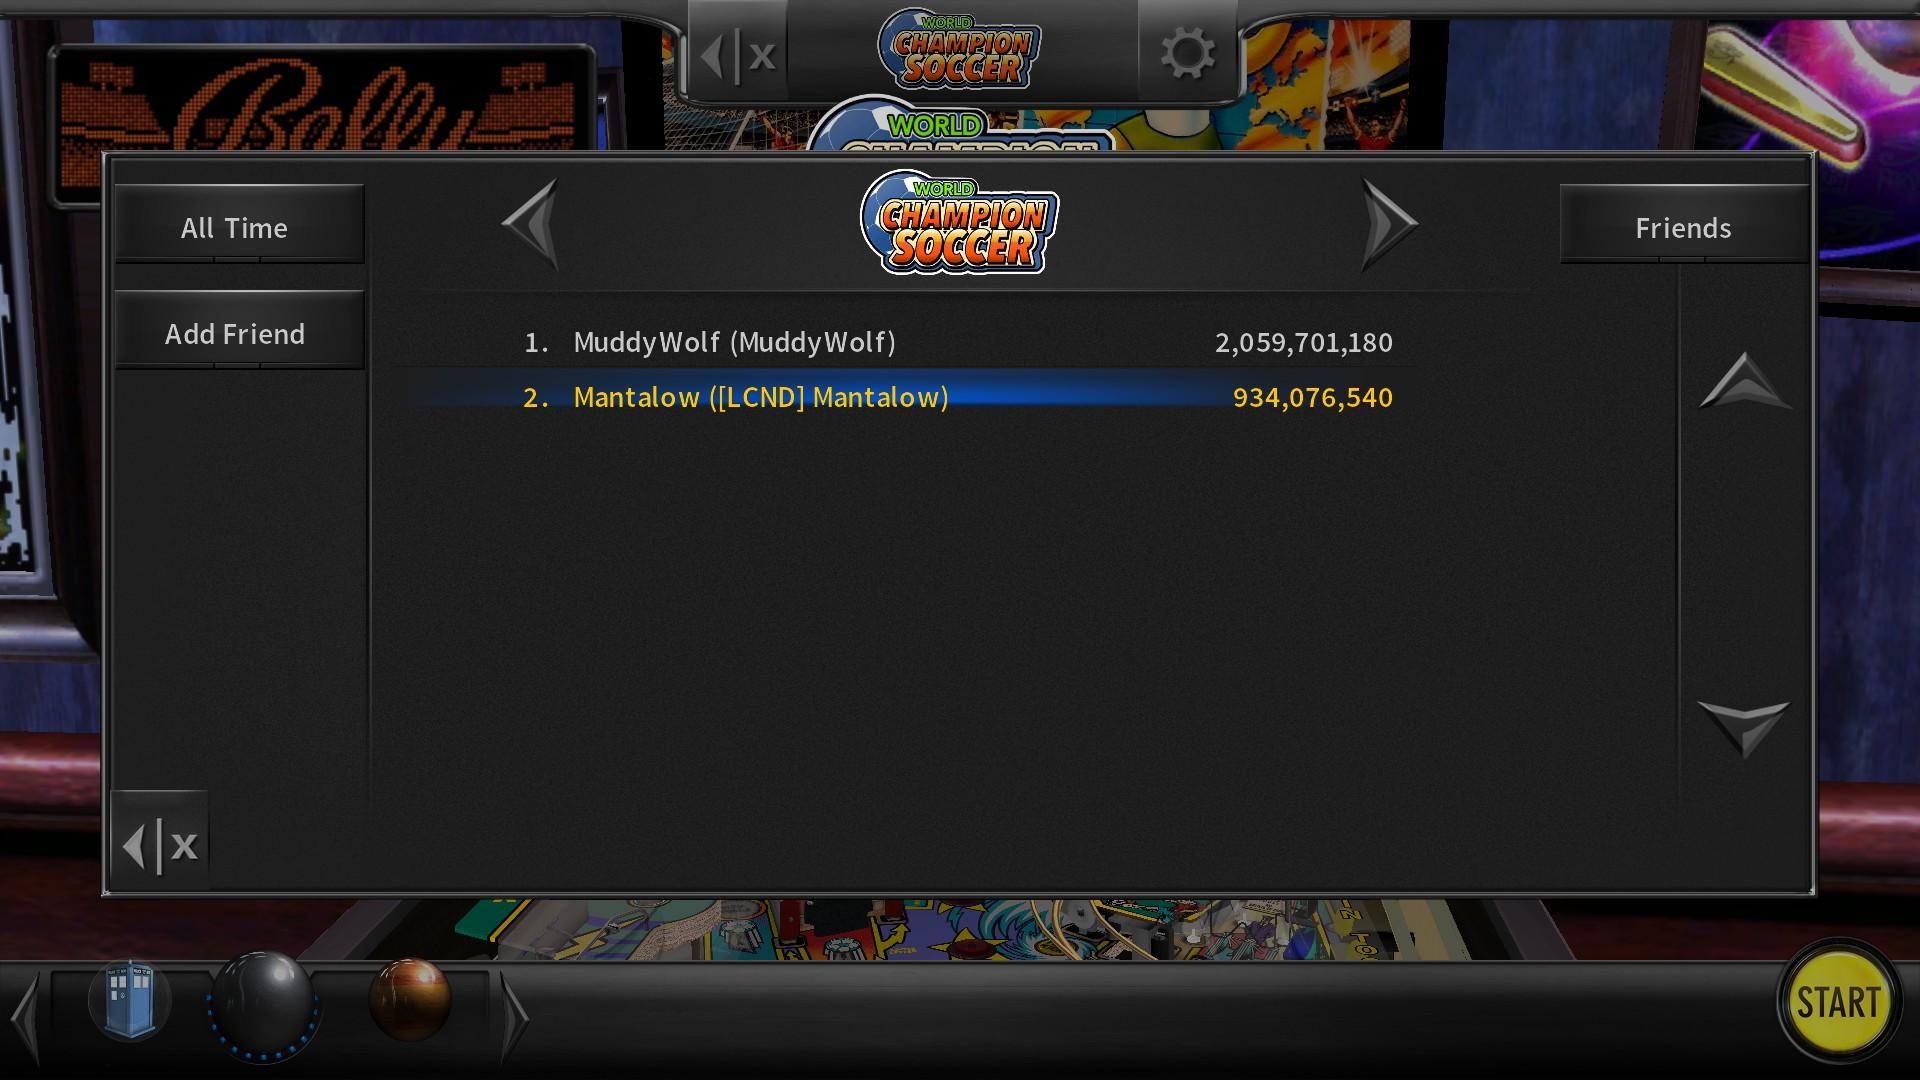 Mantalow: Pinball Arcade: World Championship Soccer (PC) 934,076,540 points on 2017-08-19 00:10:56